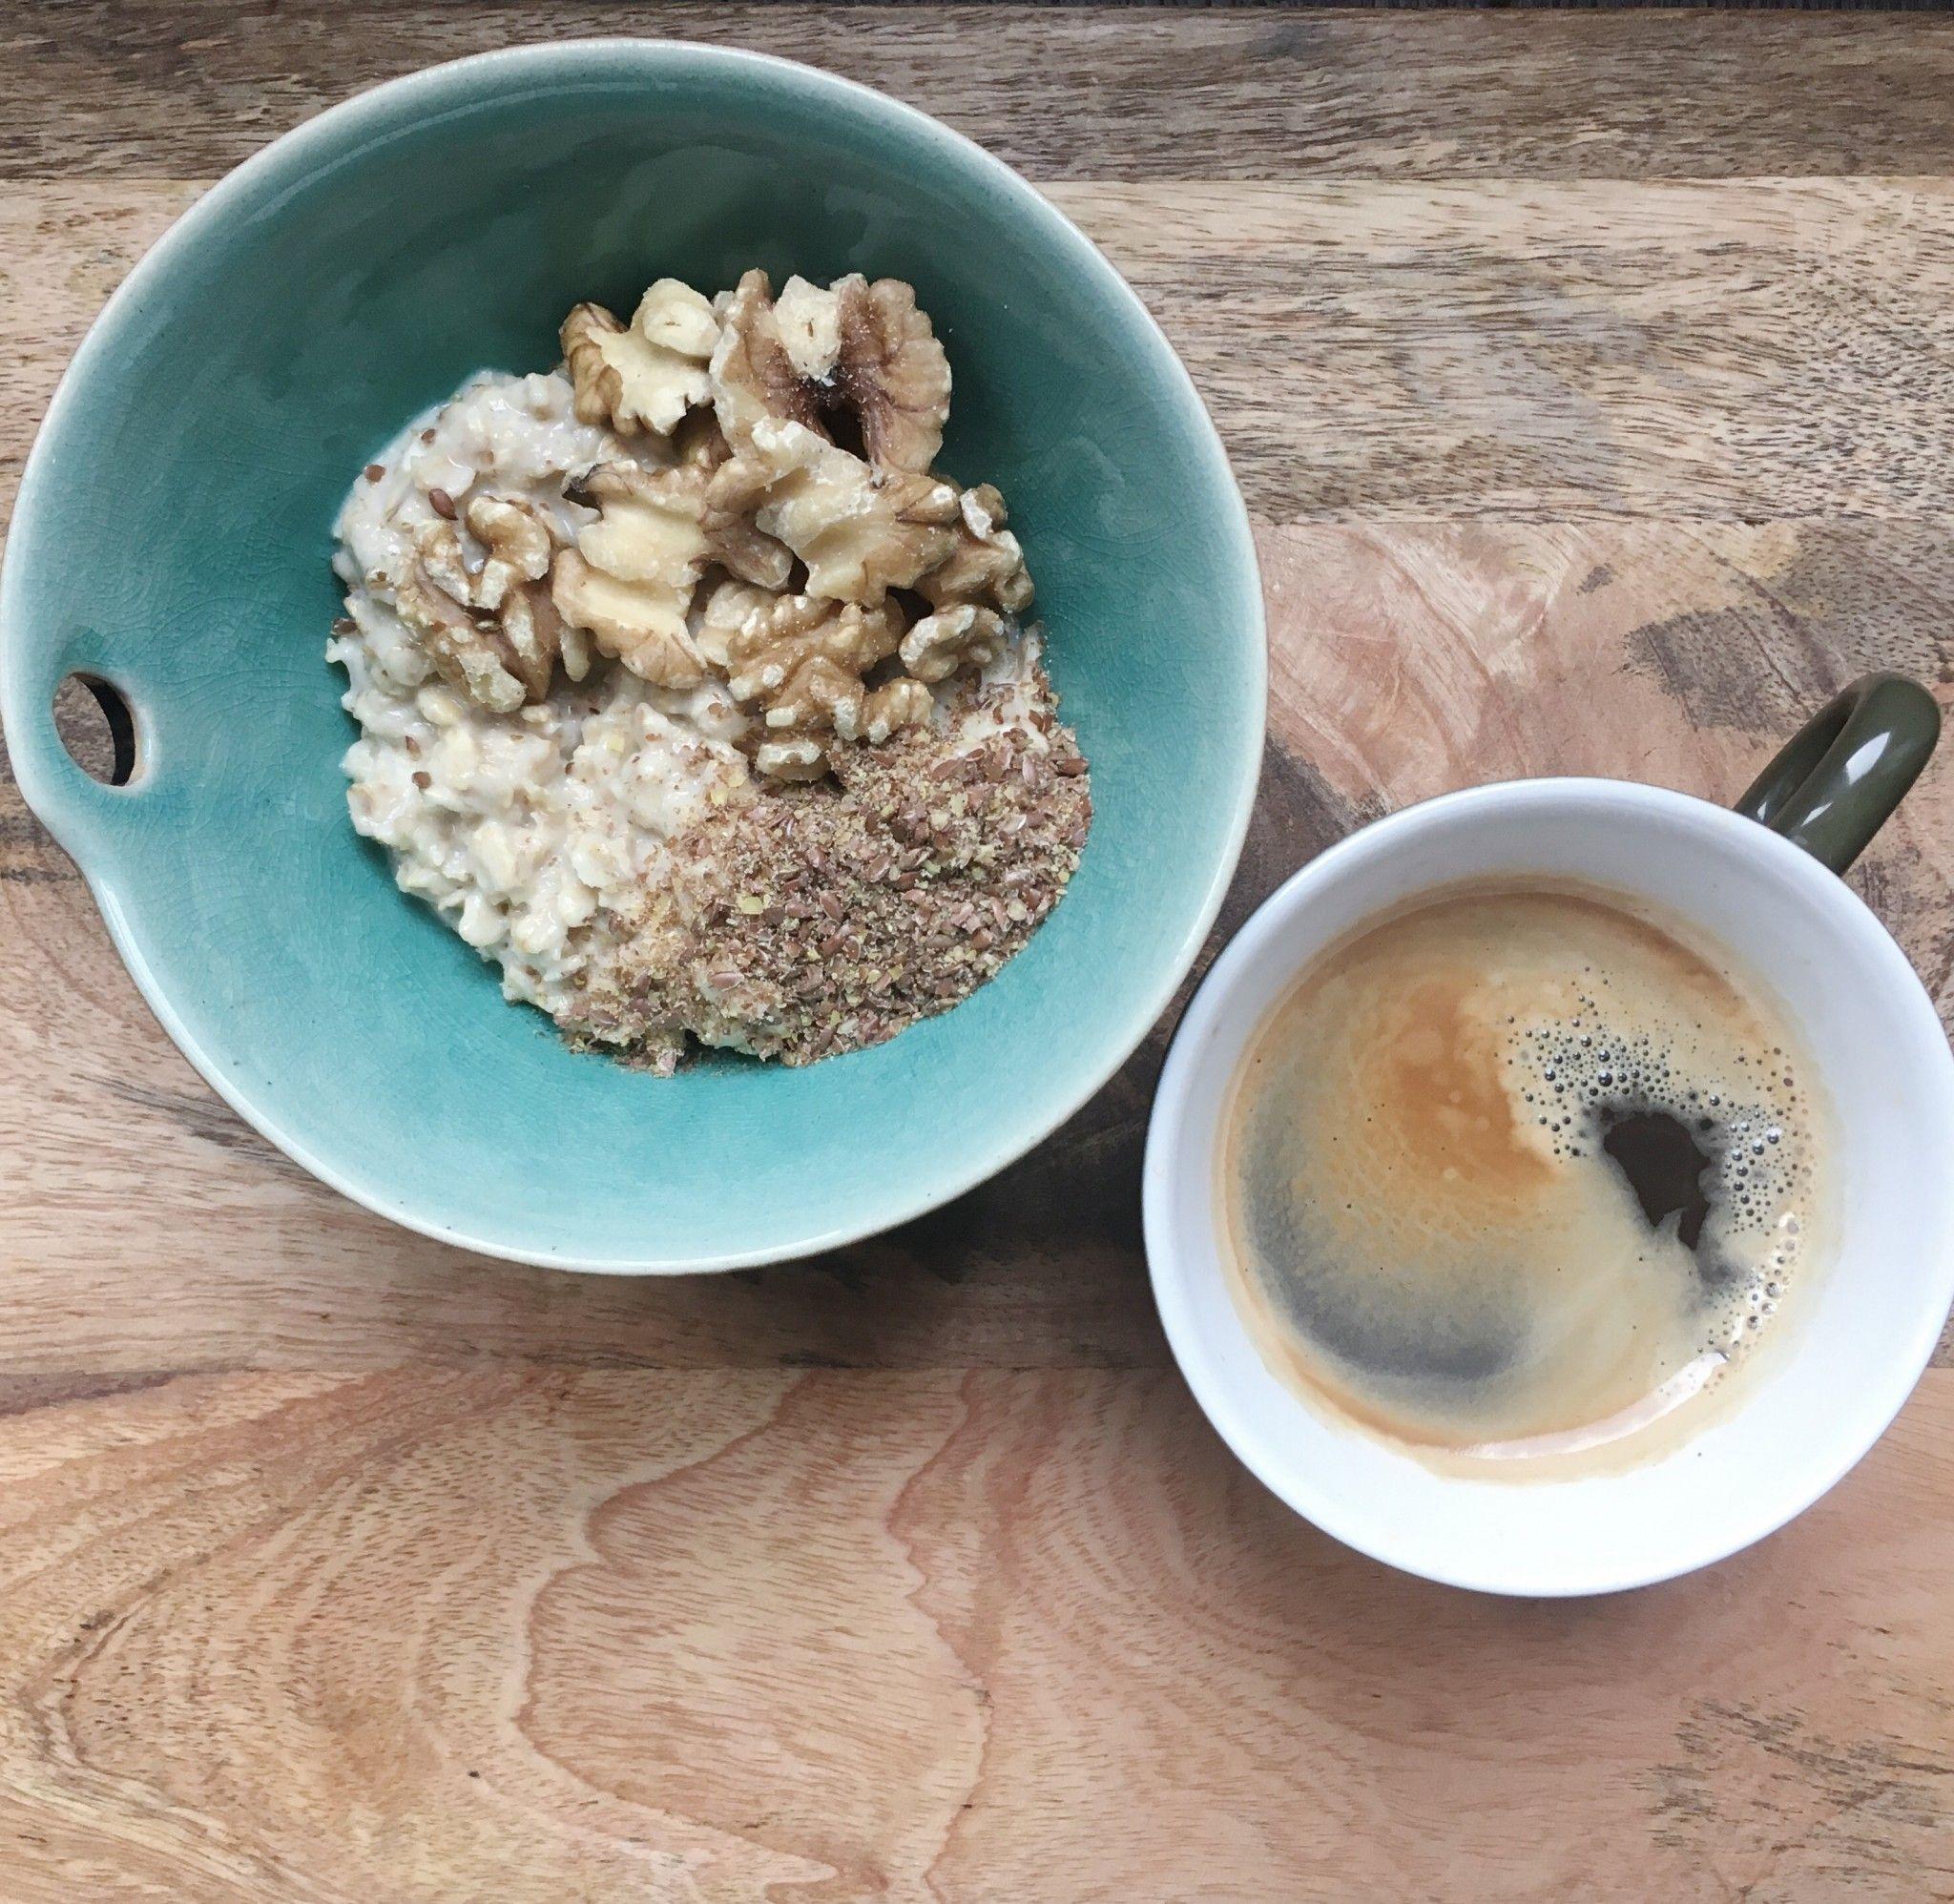 Janneke eetdagboek ontbijt